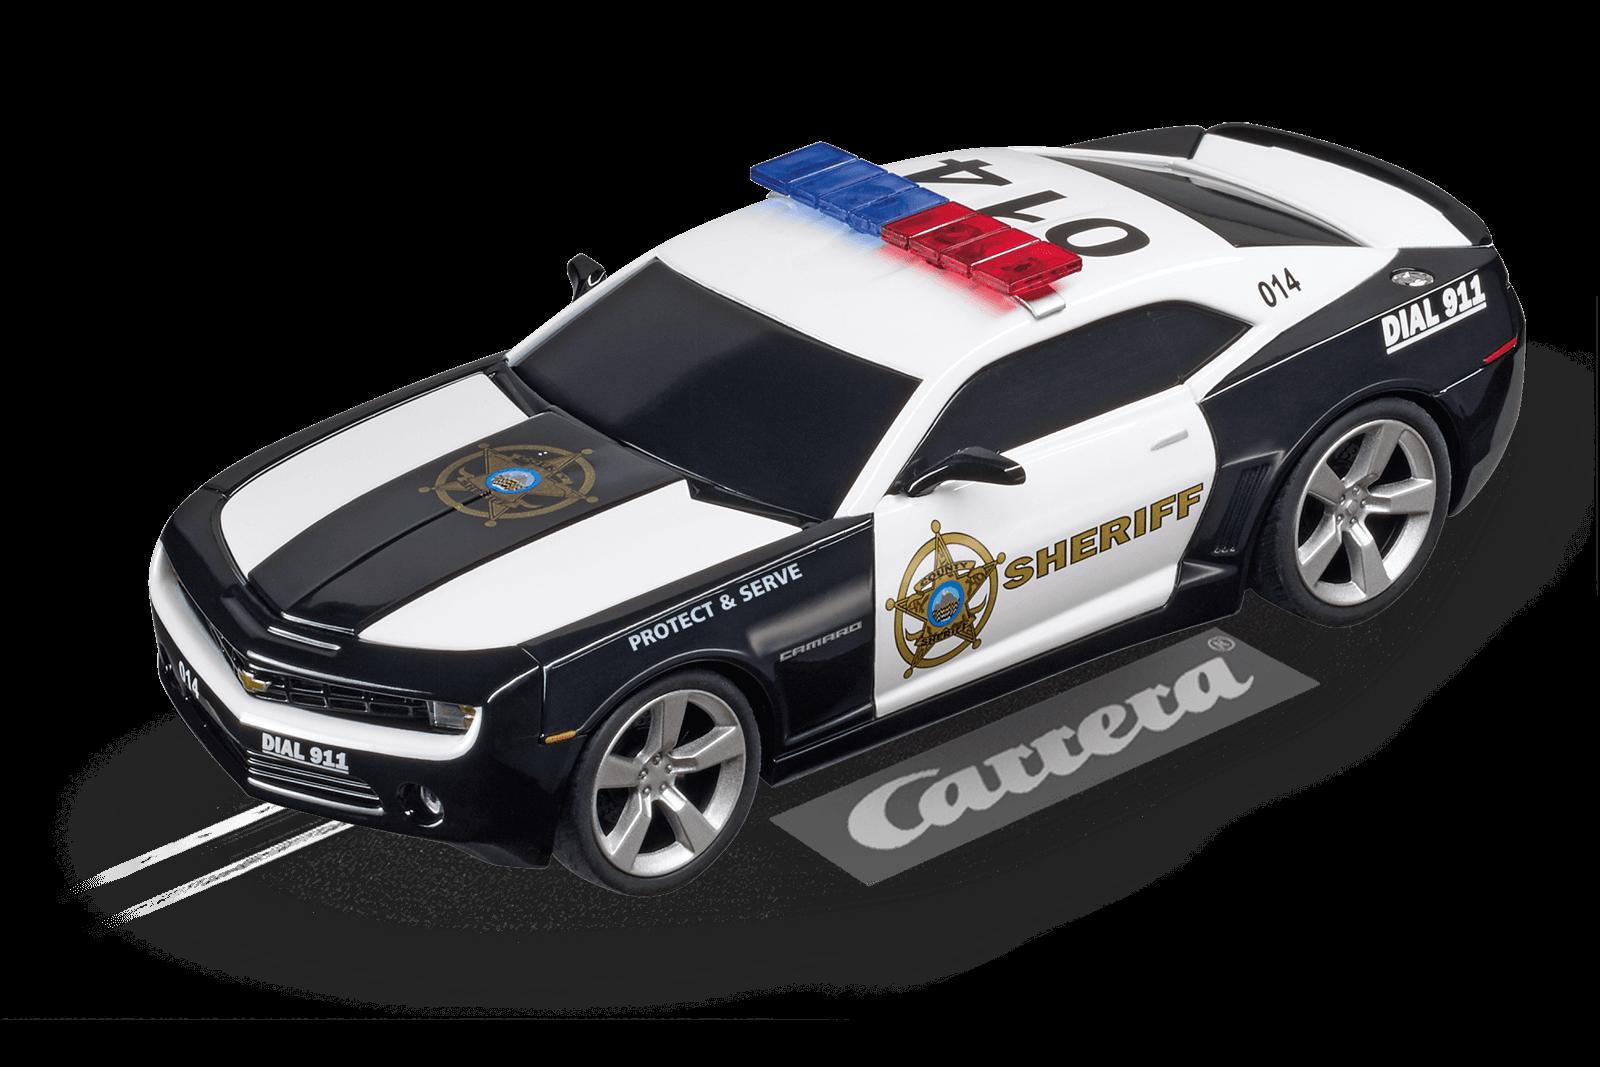 chevrolet camaro sheriff 20027523 carrera rennbahnen rc. Black Bedroom Furniture Sets. Home Design Ideas